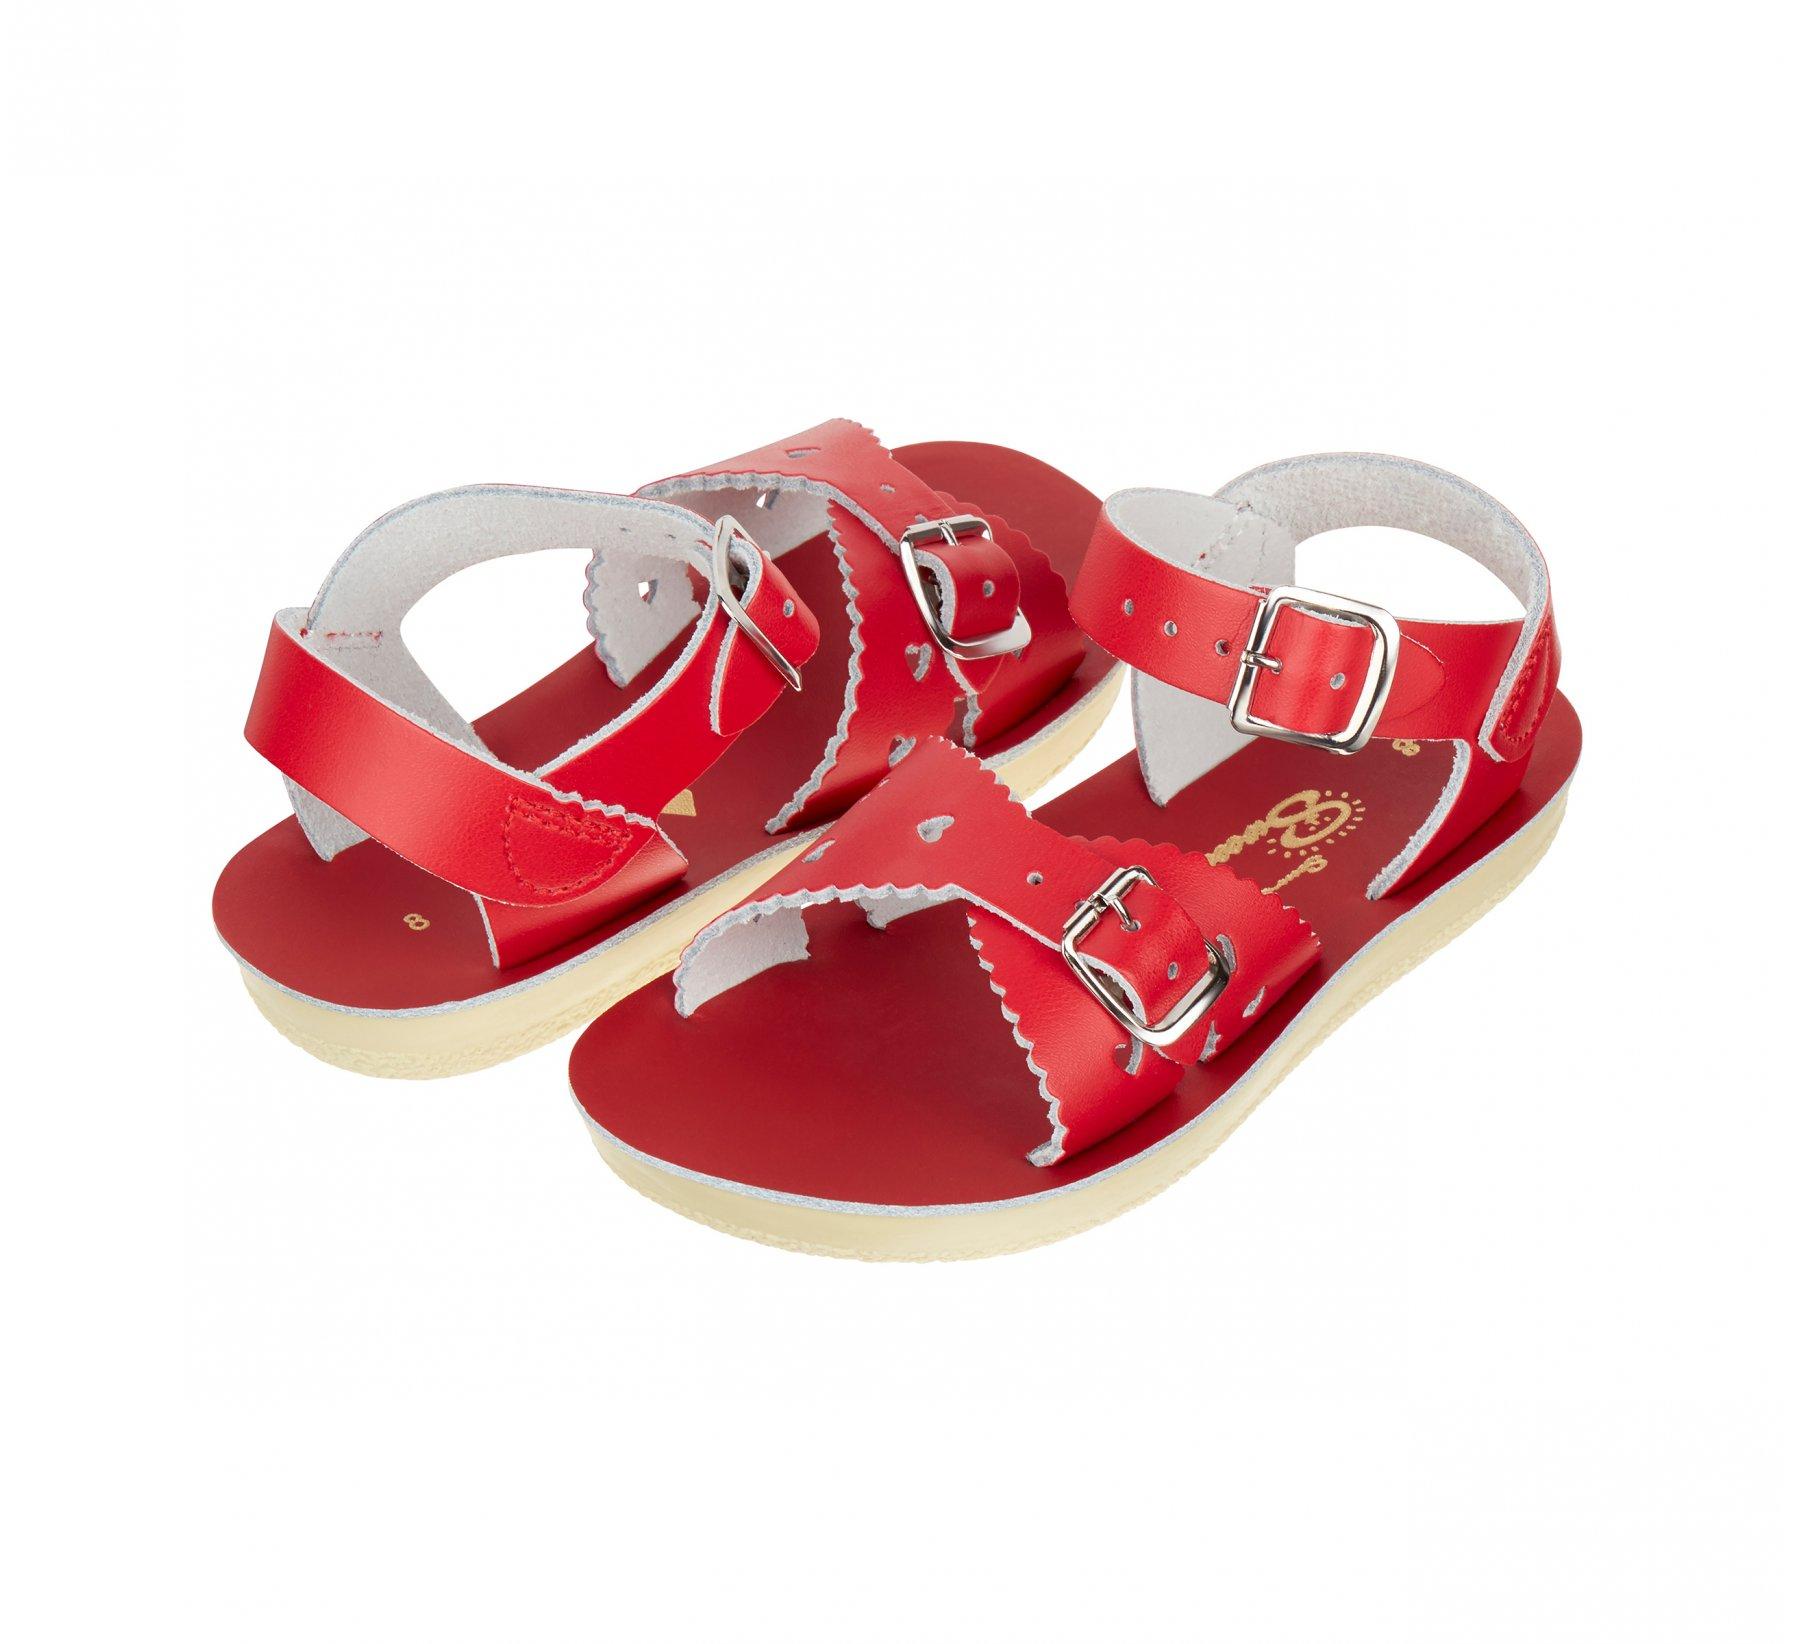 Sweetheart in Rot  - Salt Water Sandals